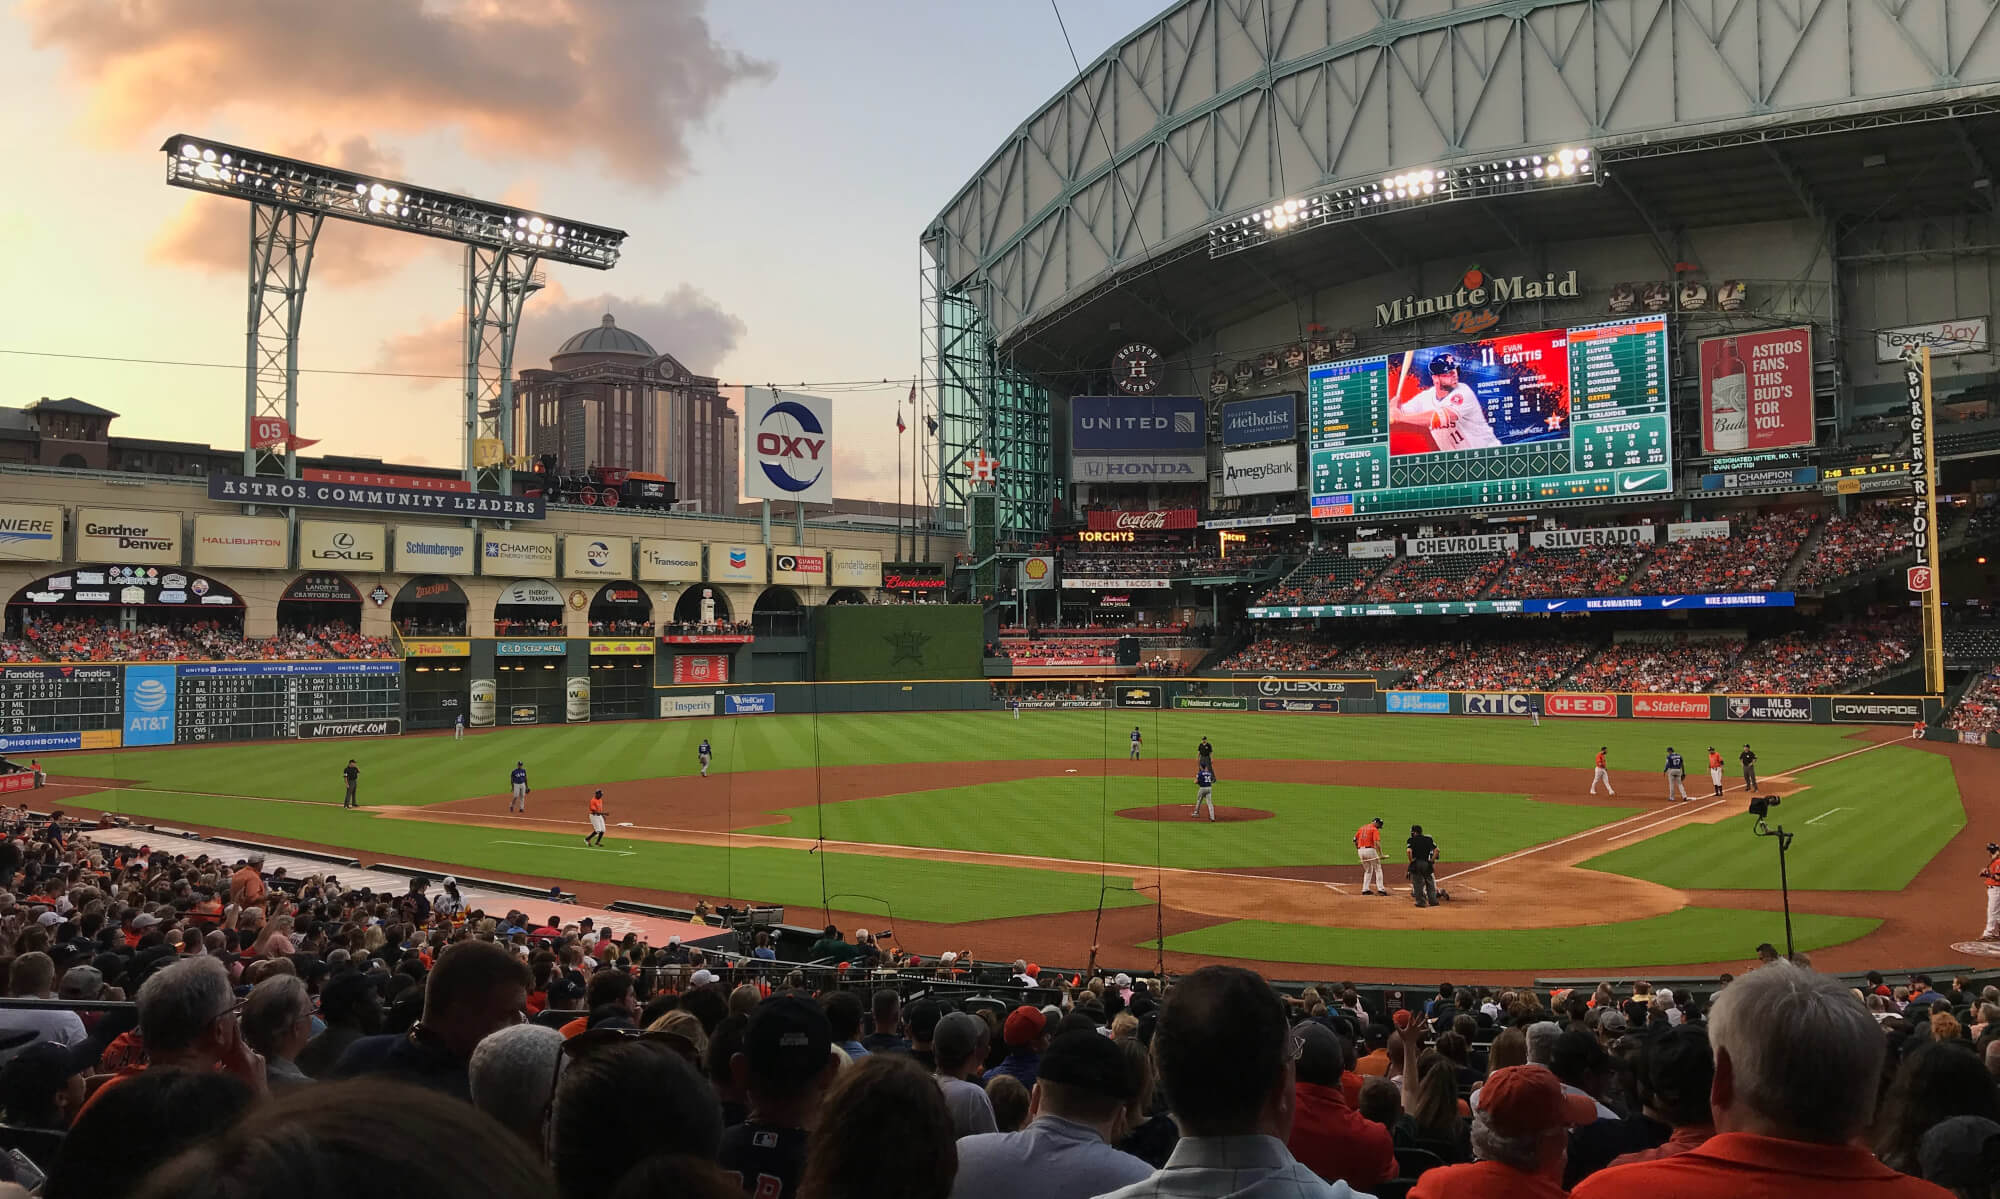 Astros Field in Houston, Texas